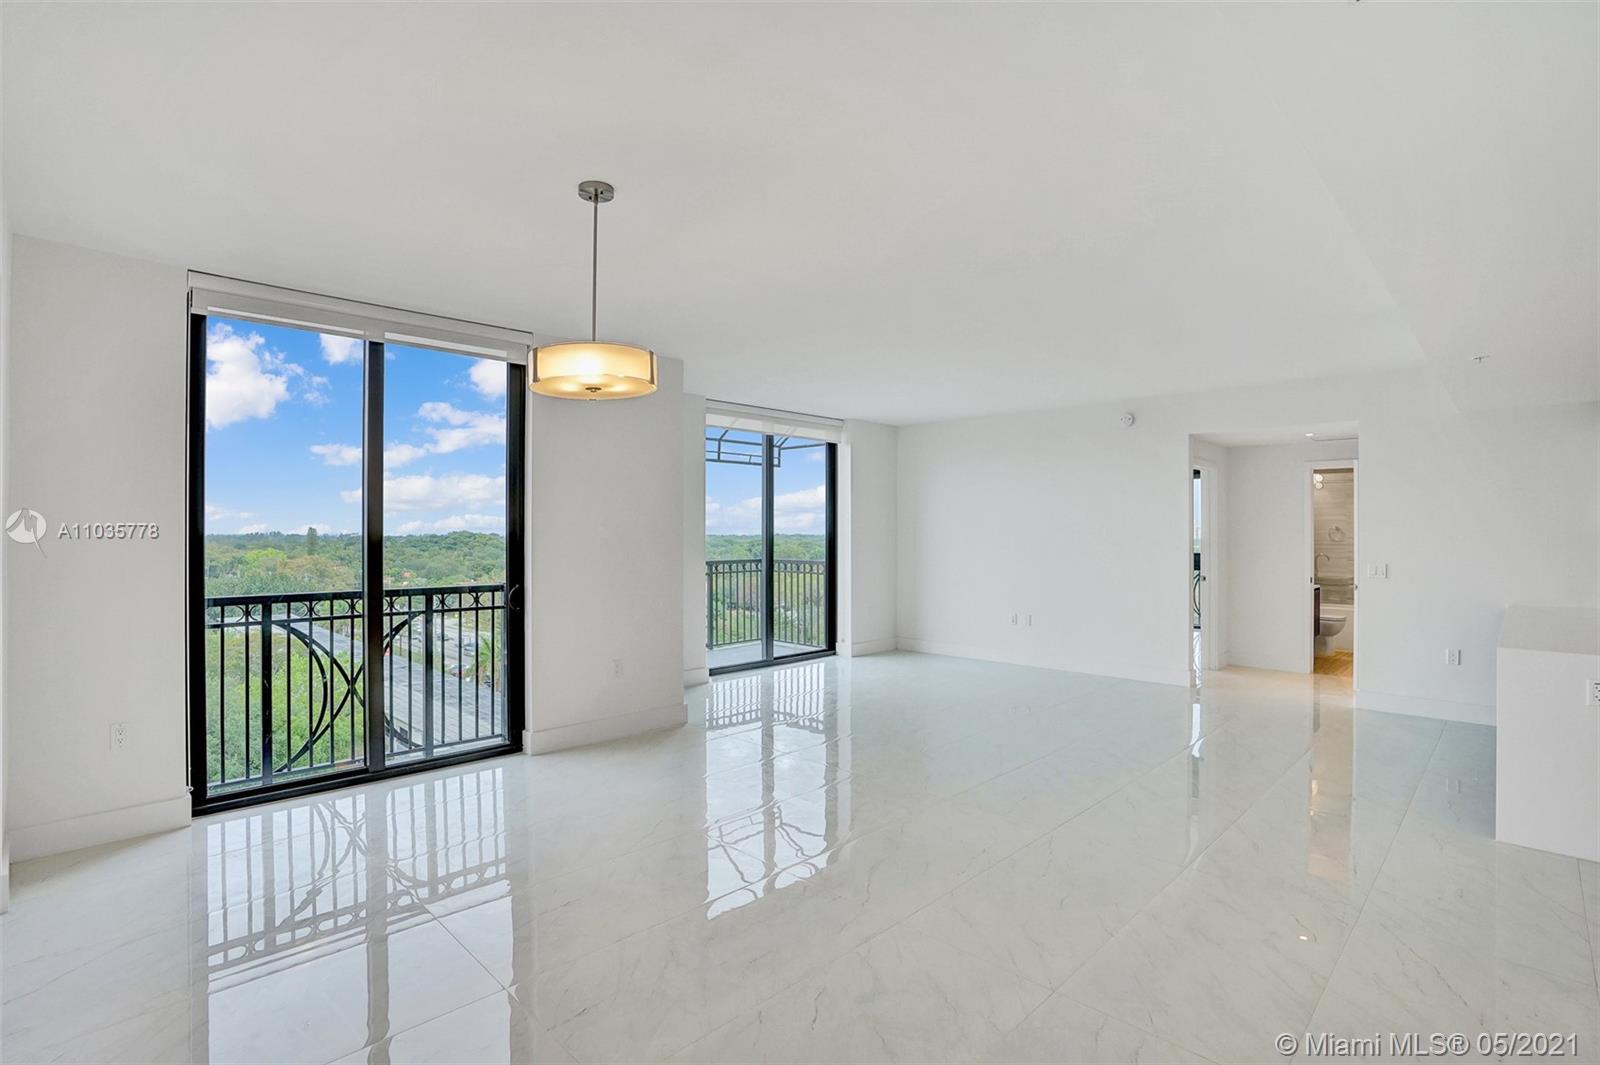 Merrick Manor #835 - 301 Altara Ave #835, Coral Gables, FL 33146